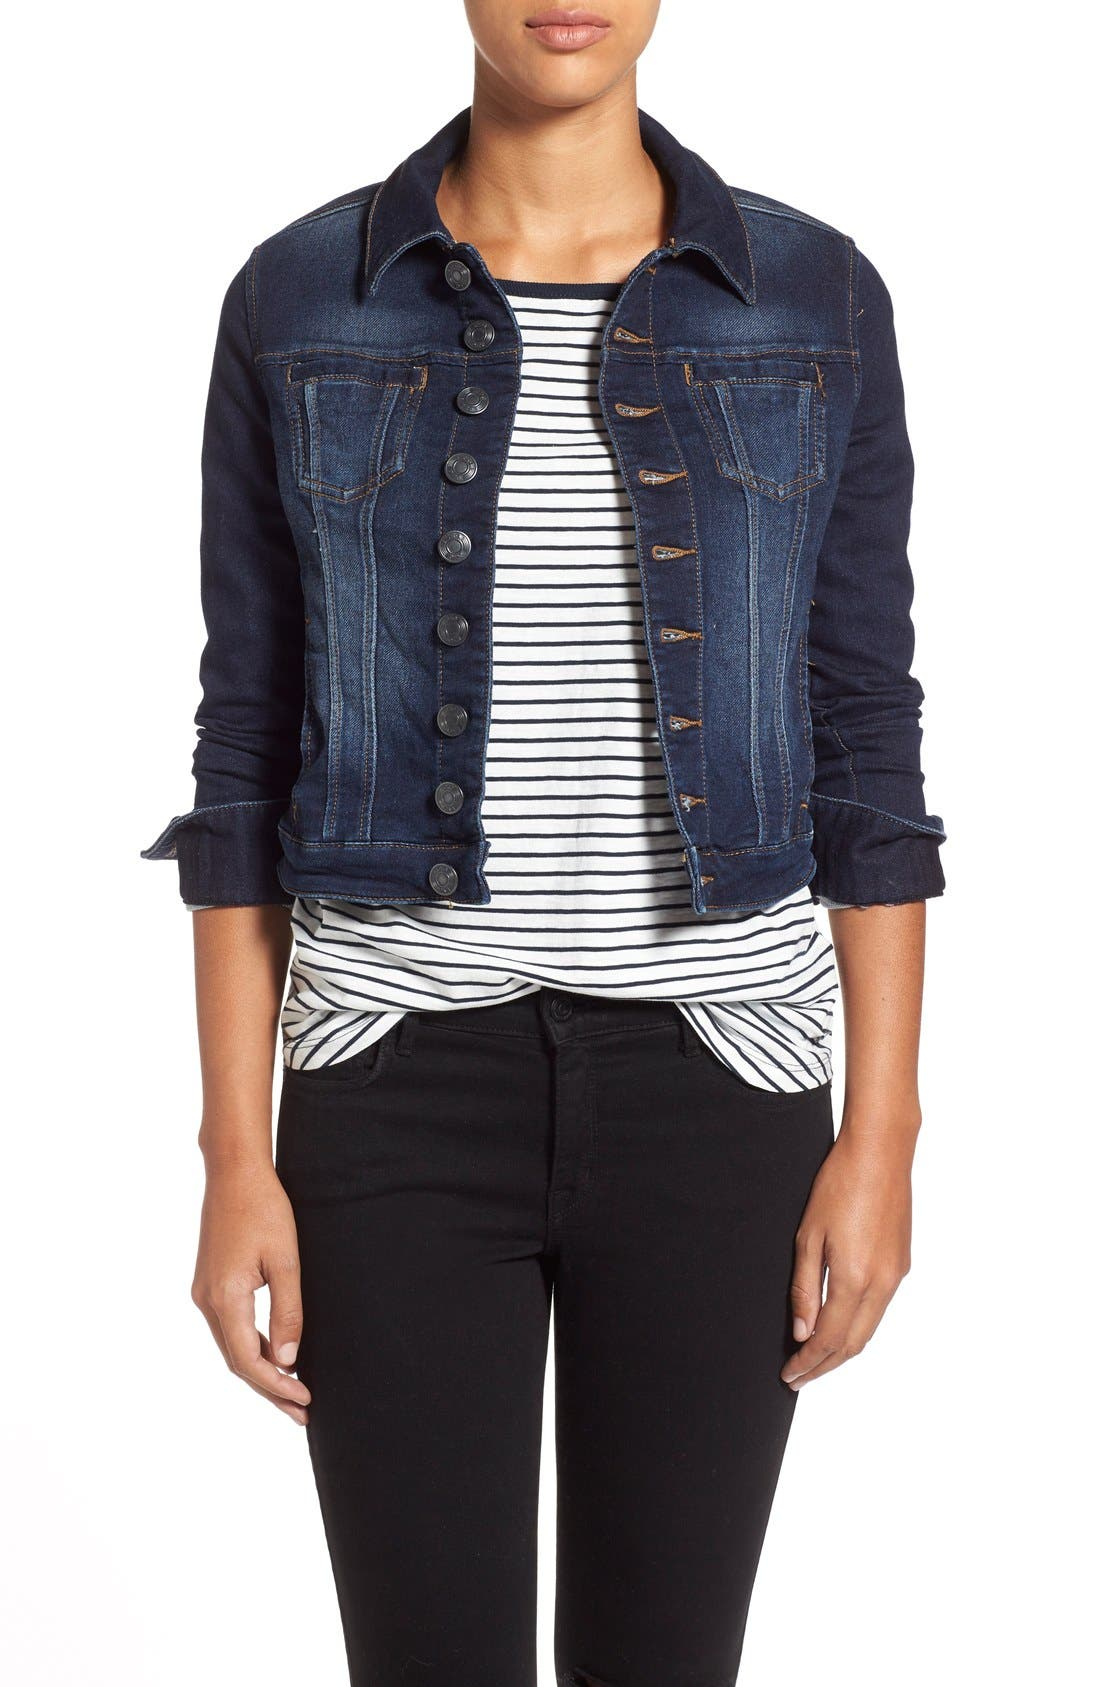 Alternate Image 1 Selected - Jag Jeans 'Savannah' Knit Denim Jacket